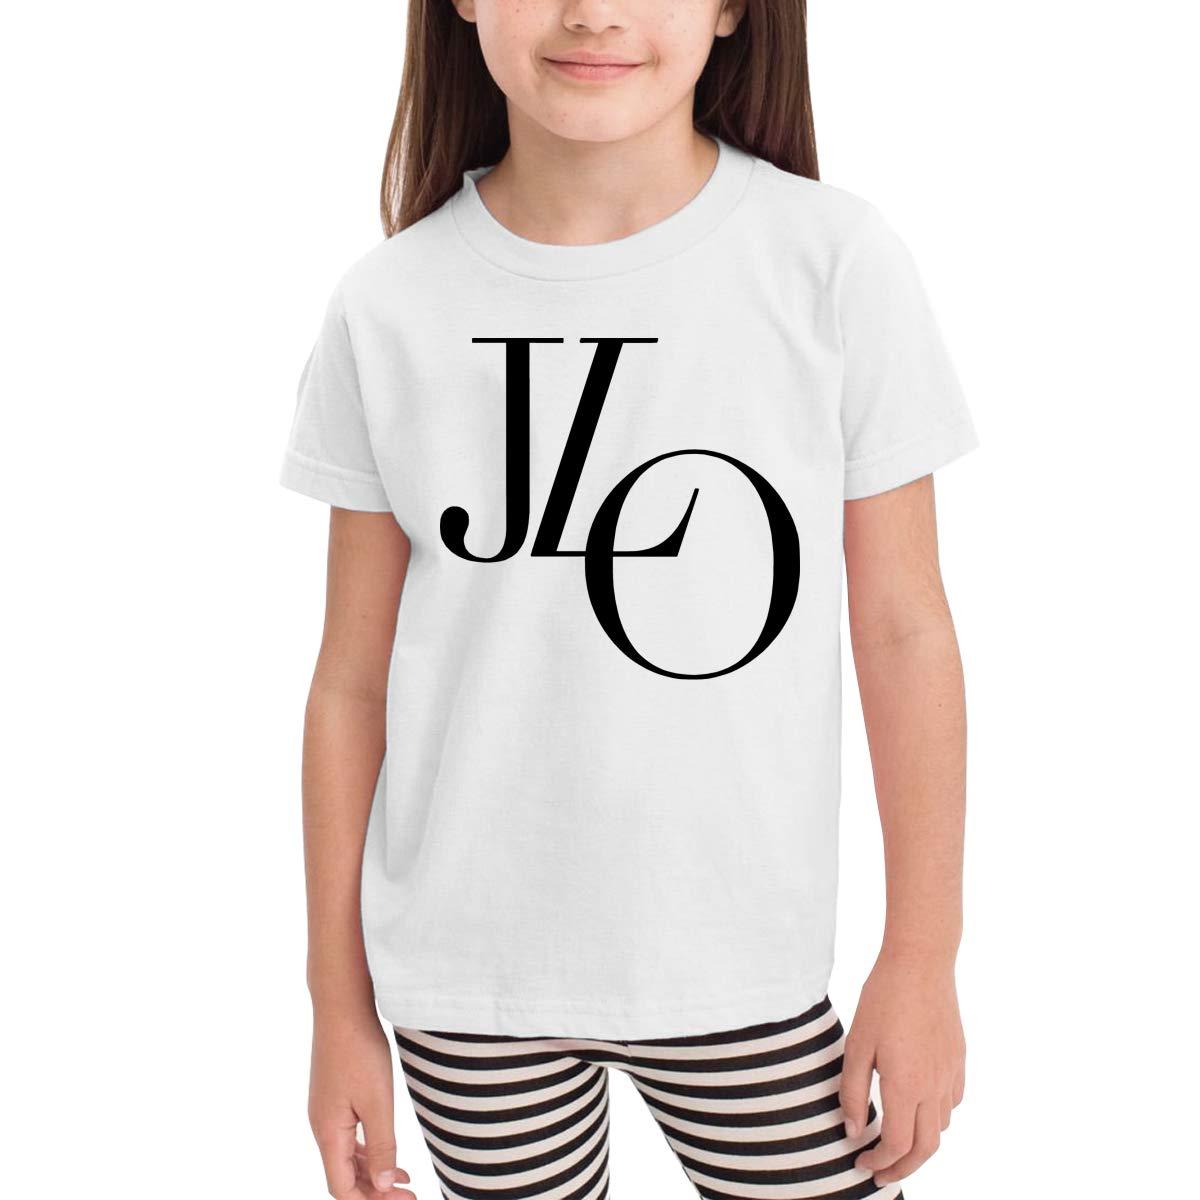 WYeter Jennifer Lopez Toddler Funny Short Sleeve Tee White